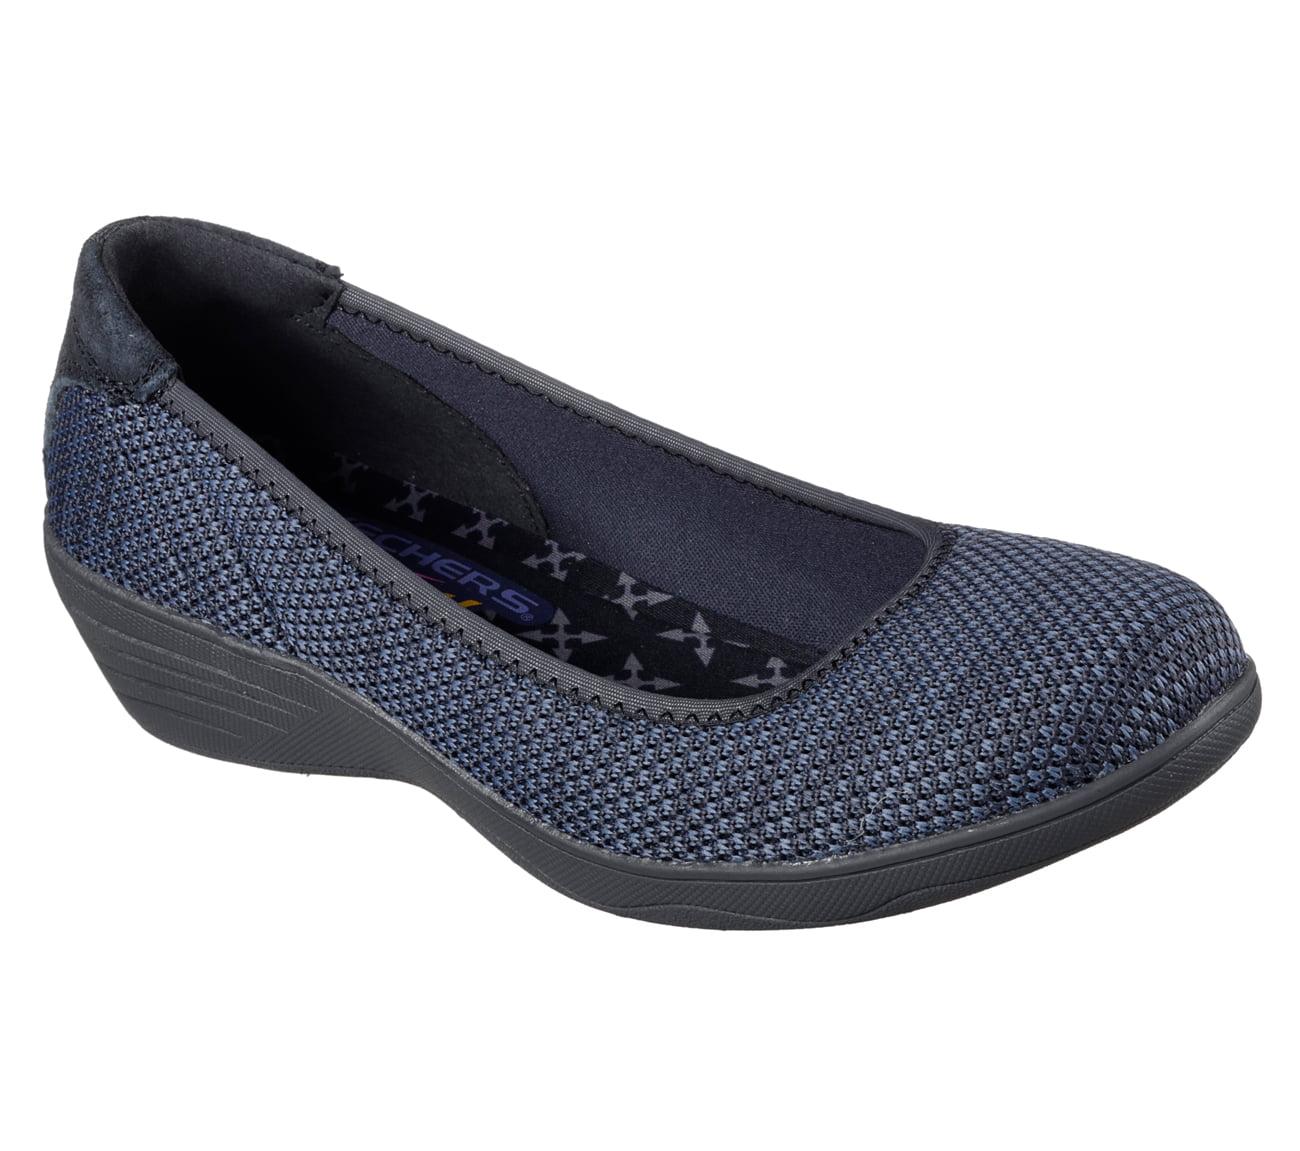 Skechers 48880NVY Women'S Kiss Casual Shoes by Skechers